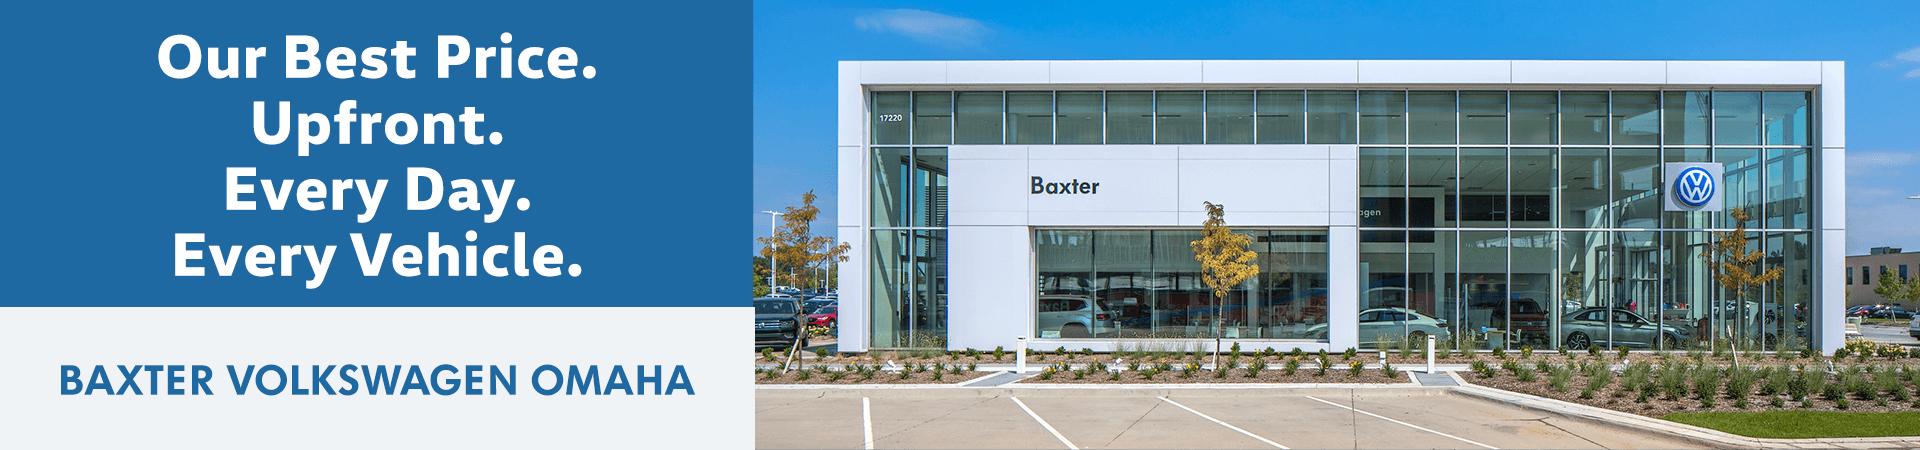 Baxter Volkswagen Omaha | Upfront Pricing